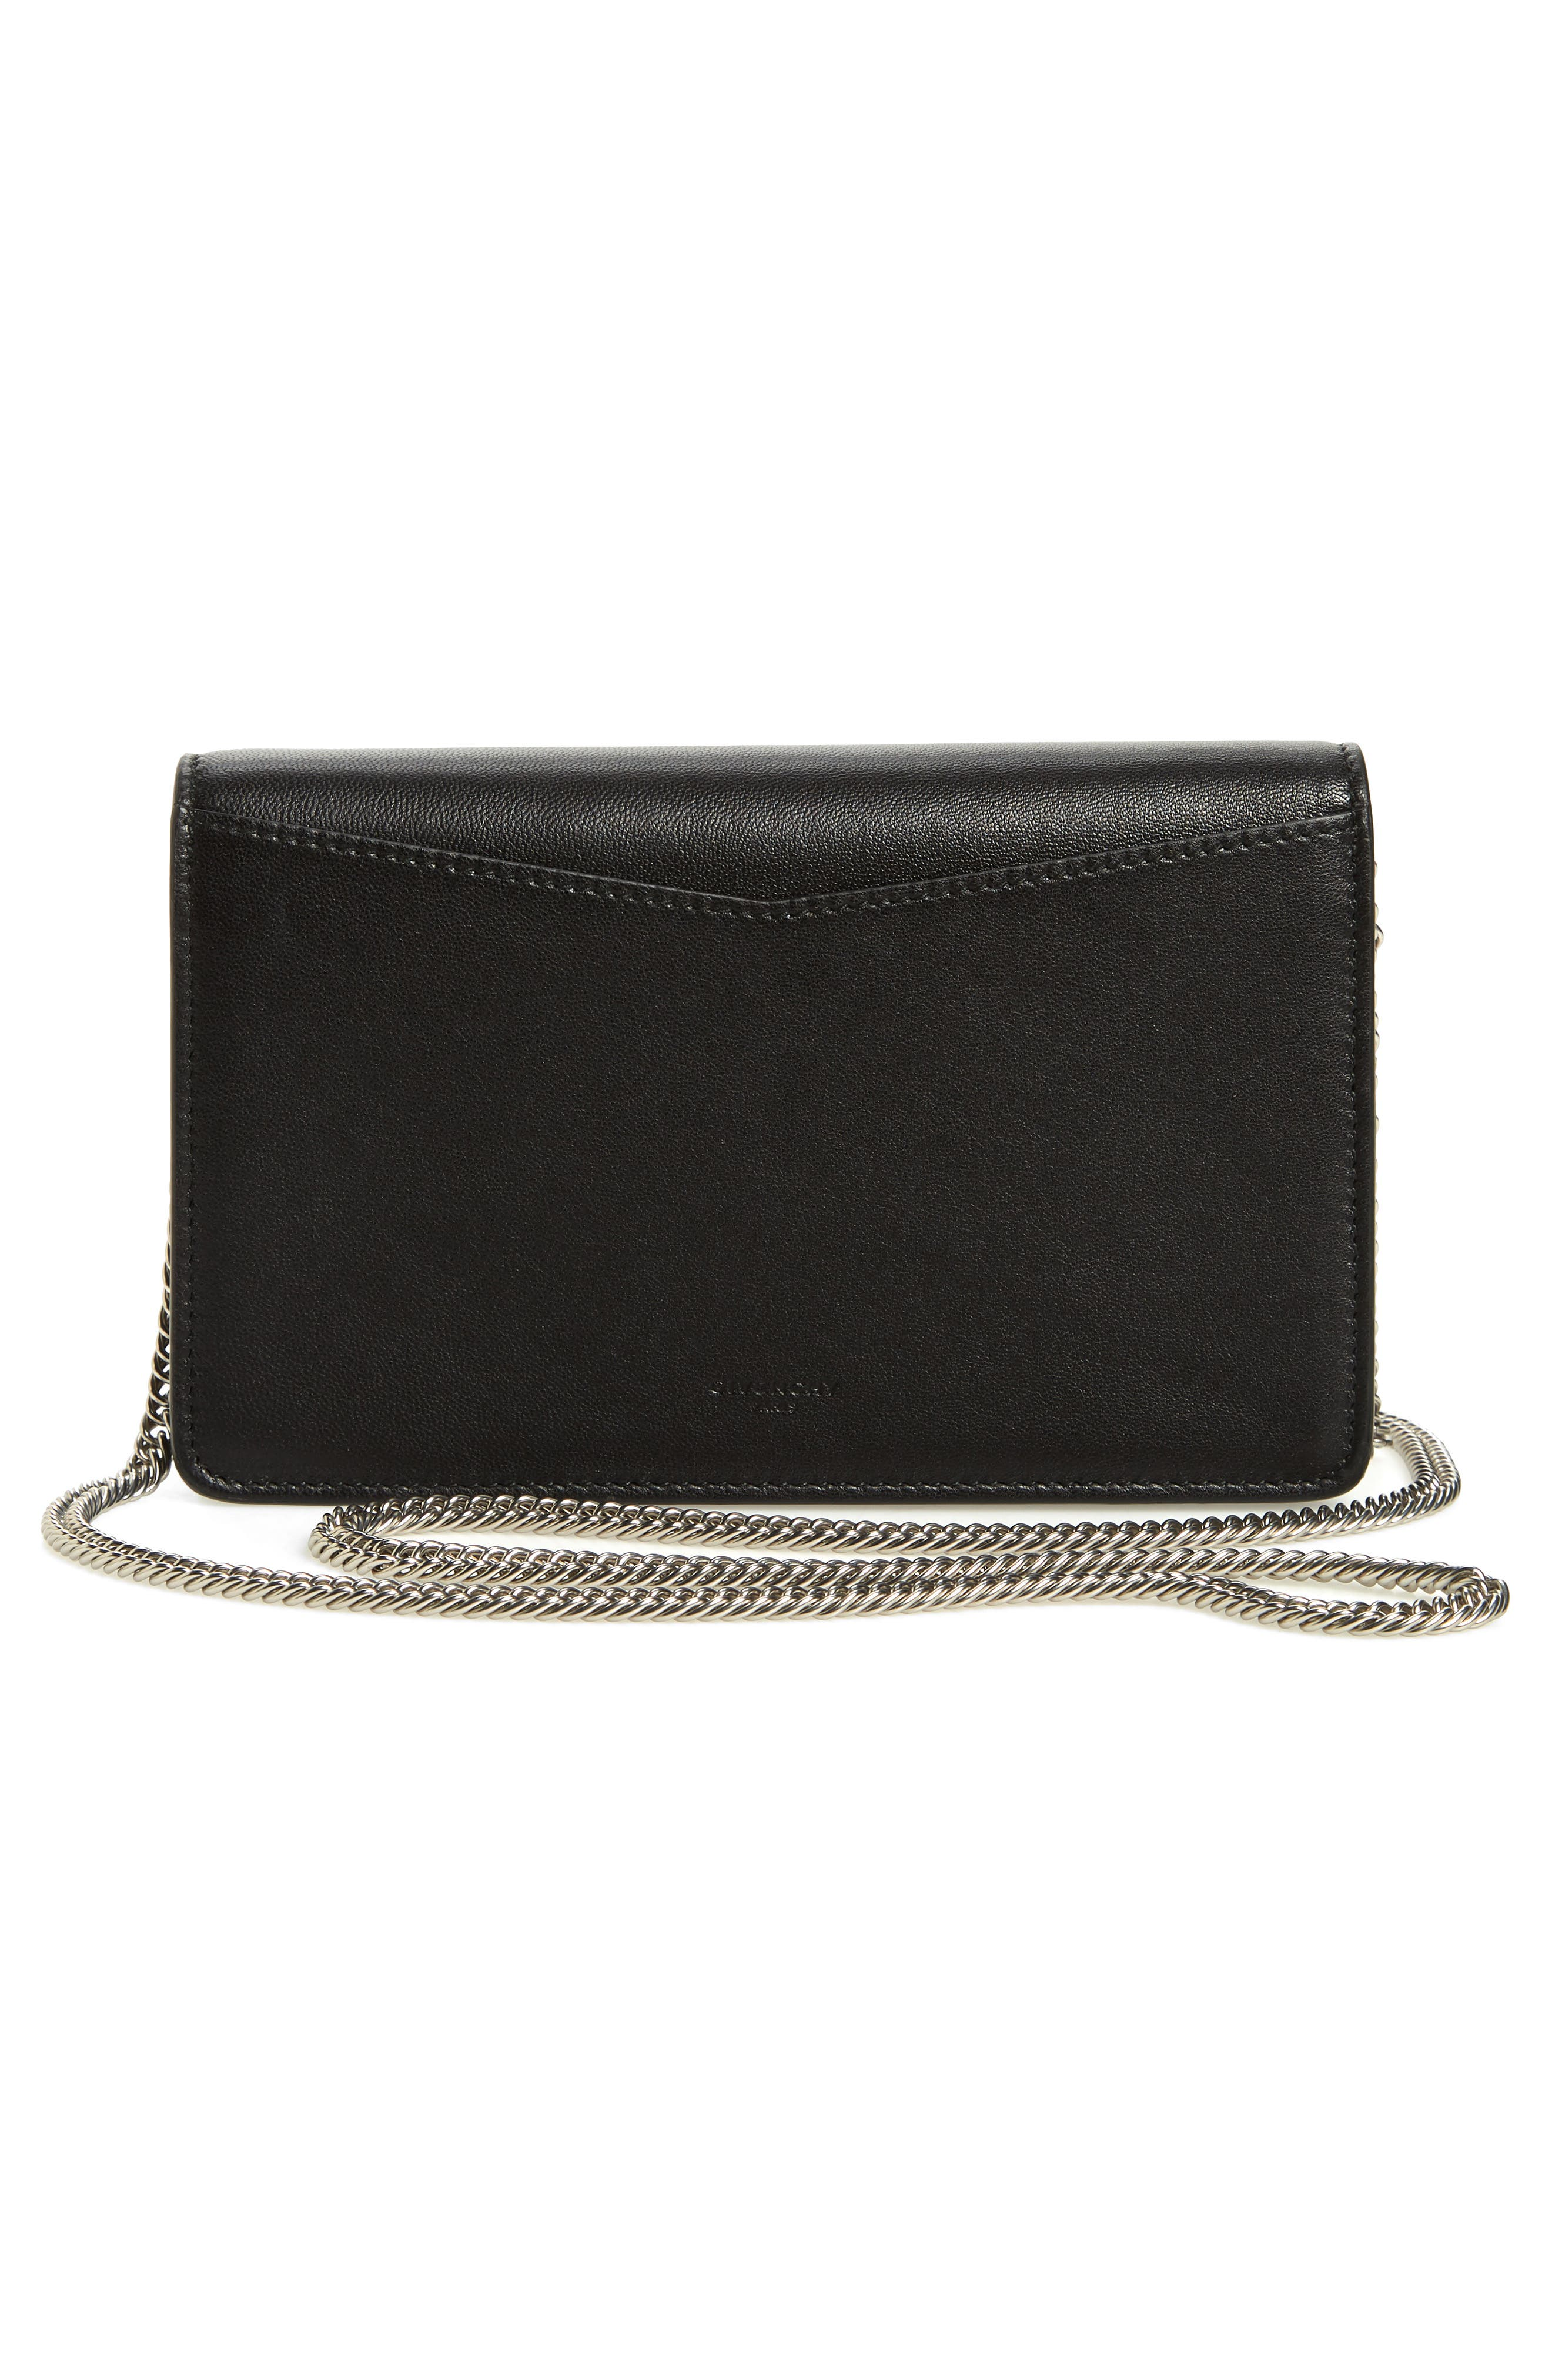 Emblem Lambskin Leather Crossbody Bag,                             Alternate thumbnail 3, color,                             BLACK